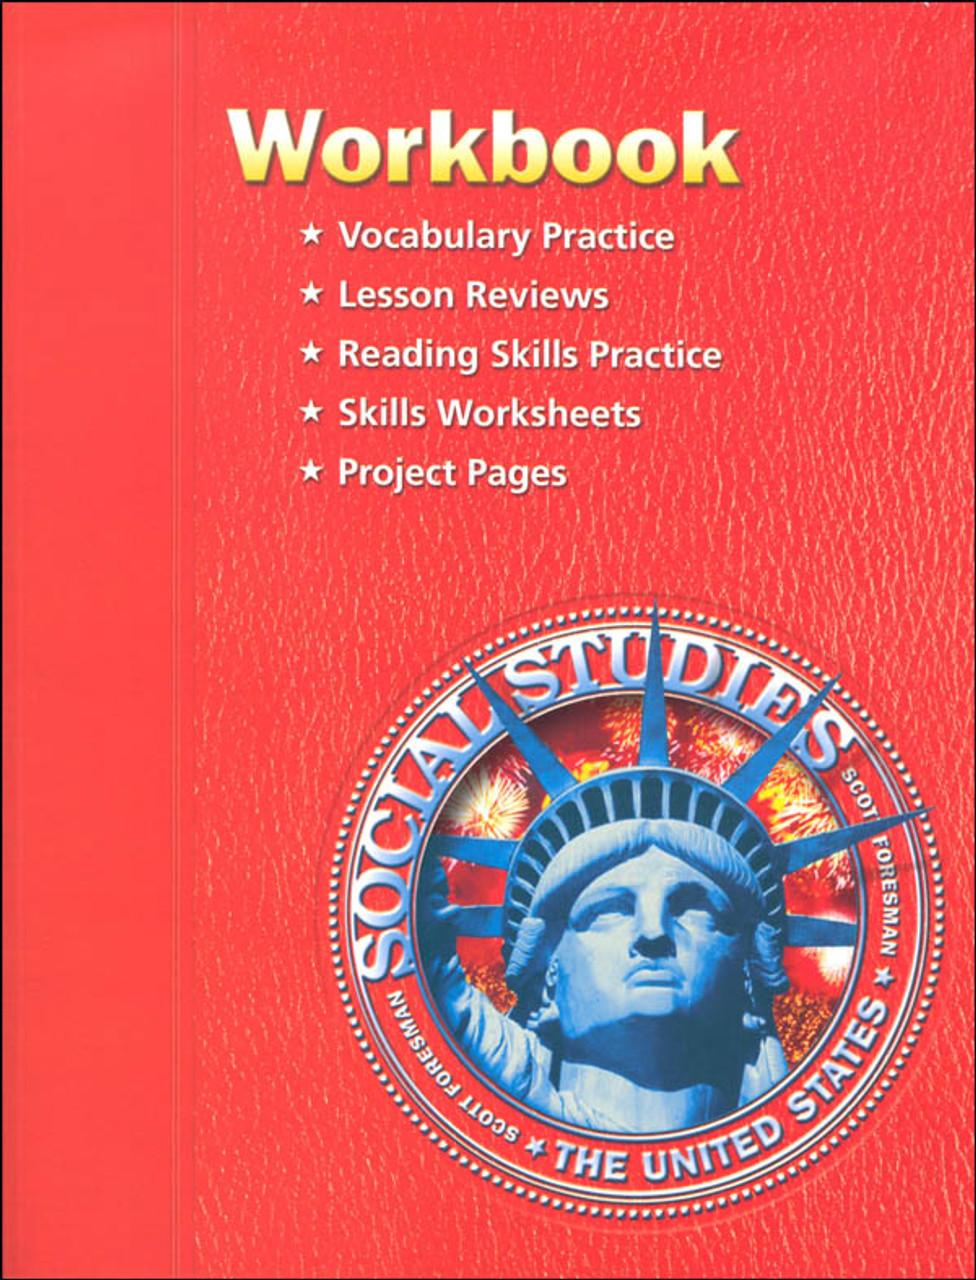 Scott Foresman Social Studies Grade 5 Student Workbook - The United States  - Classroom Resource Center [ 1280 x 976 Pixel ]